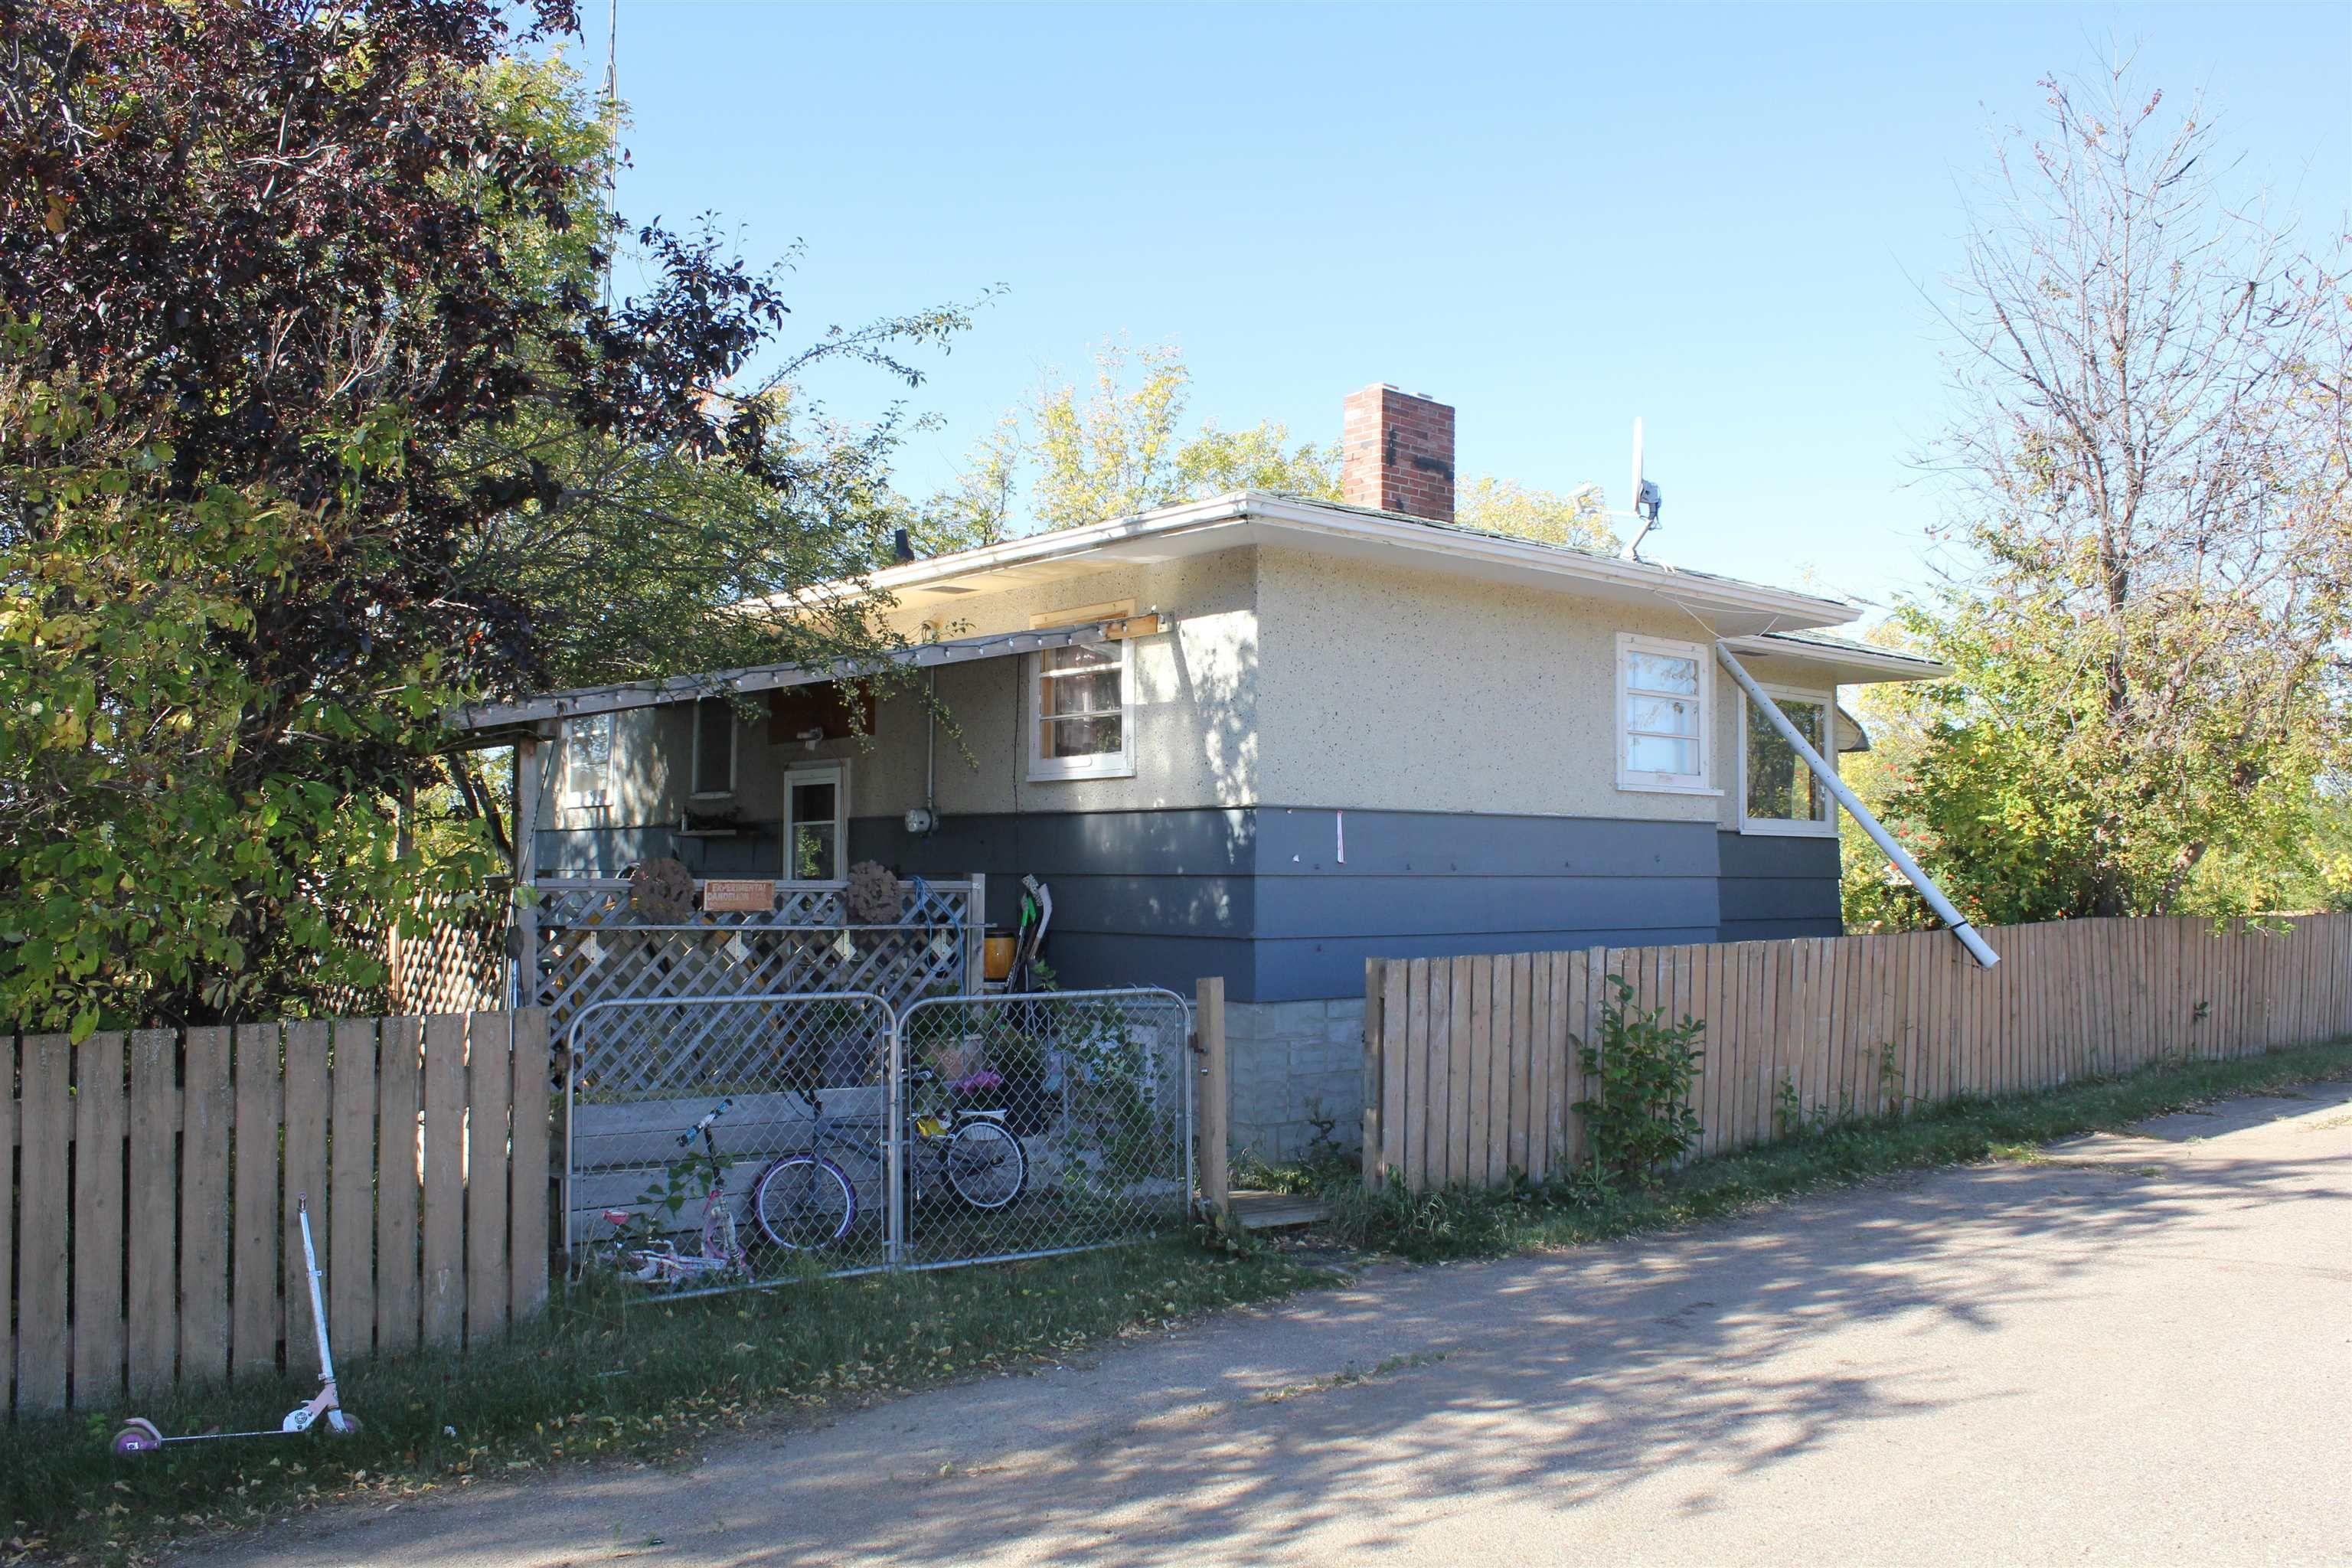 Main Photo: 125 1st Street W: Derwent House for sale : MLS®# E4262216